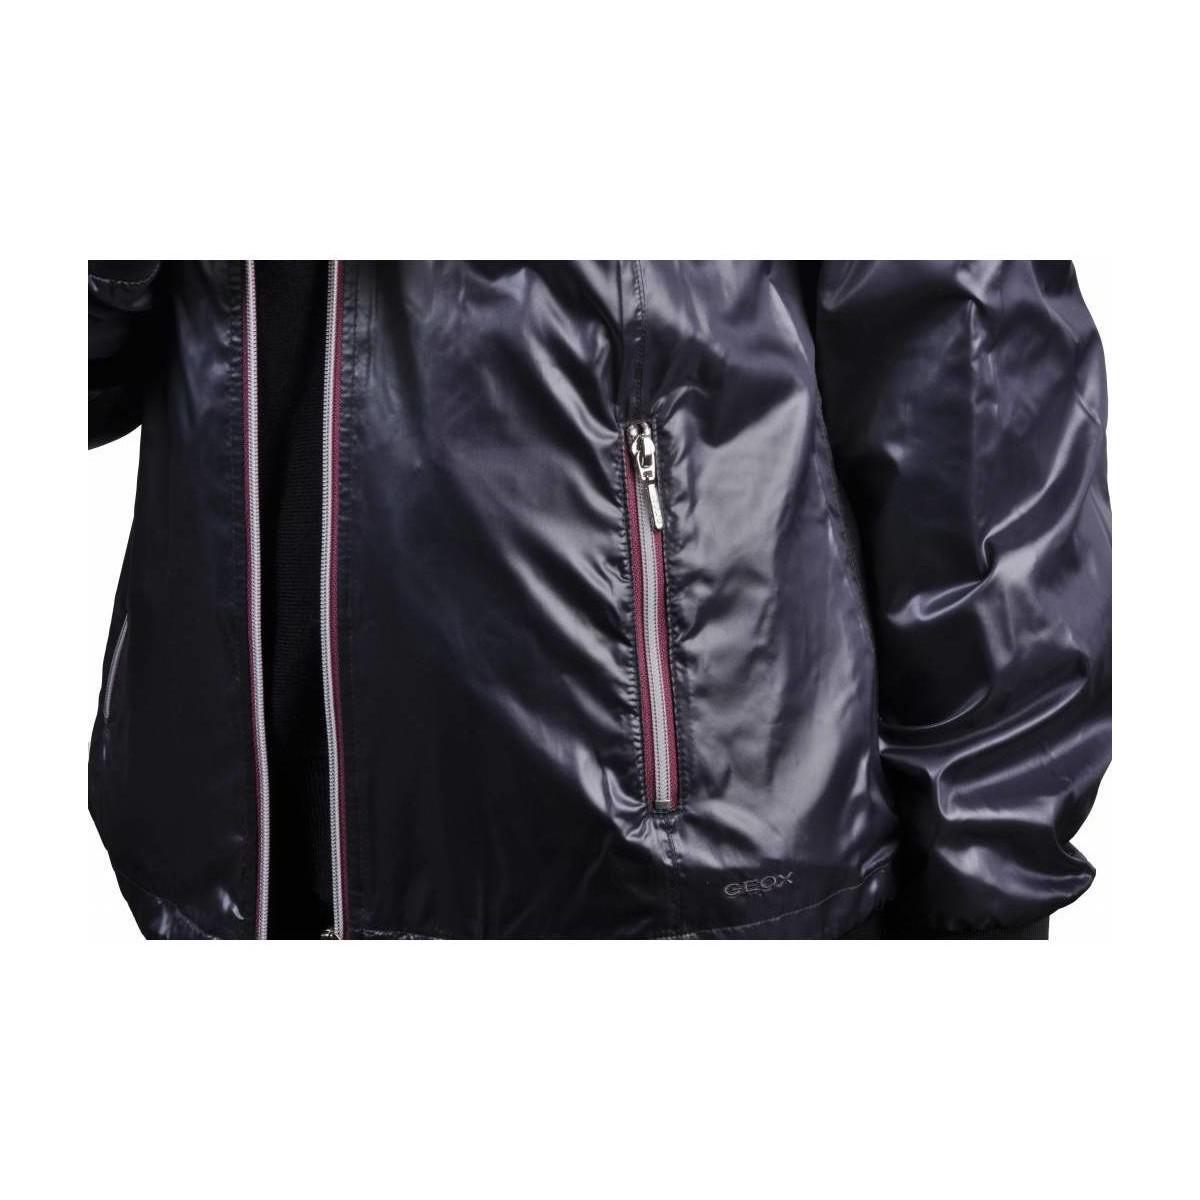 En detalle Tradicion asesino  Geox Chaqueta Mujer Primavera Women's Jacket In Purple - Lyst